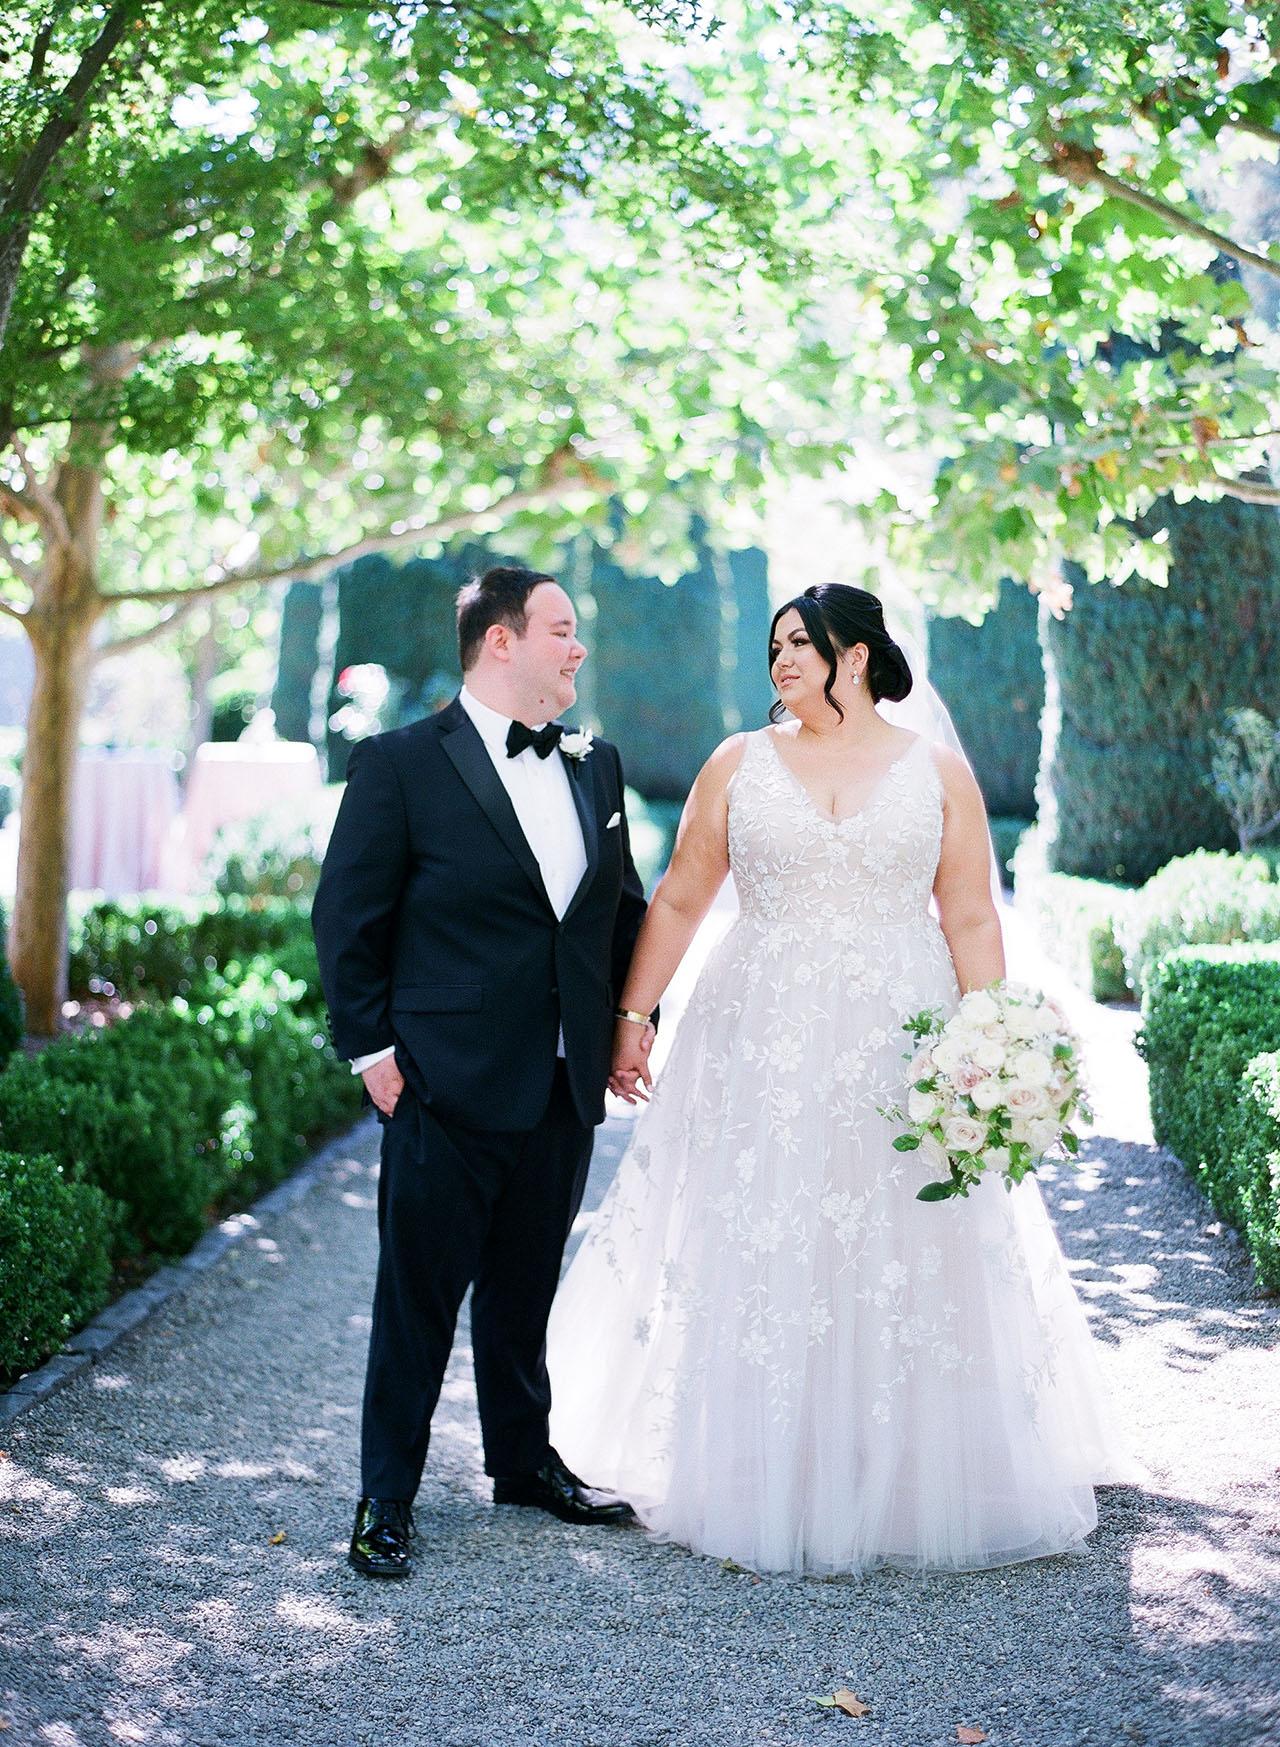 gillian tyler wedding couple holding hands